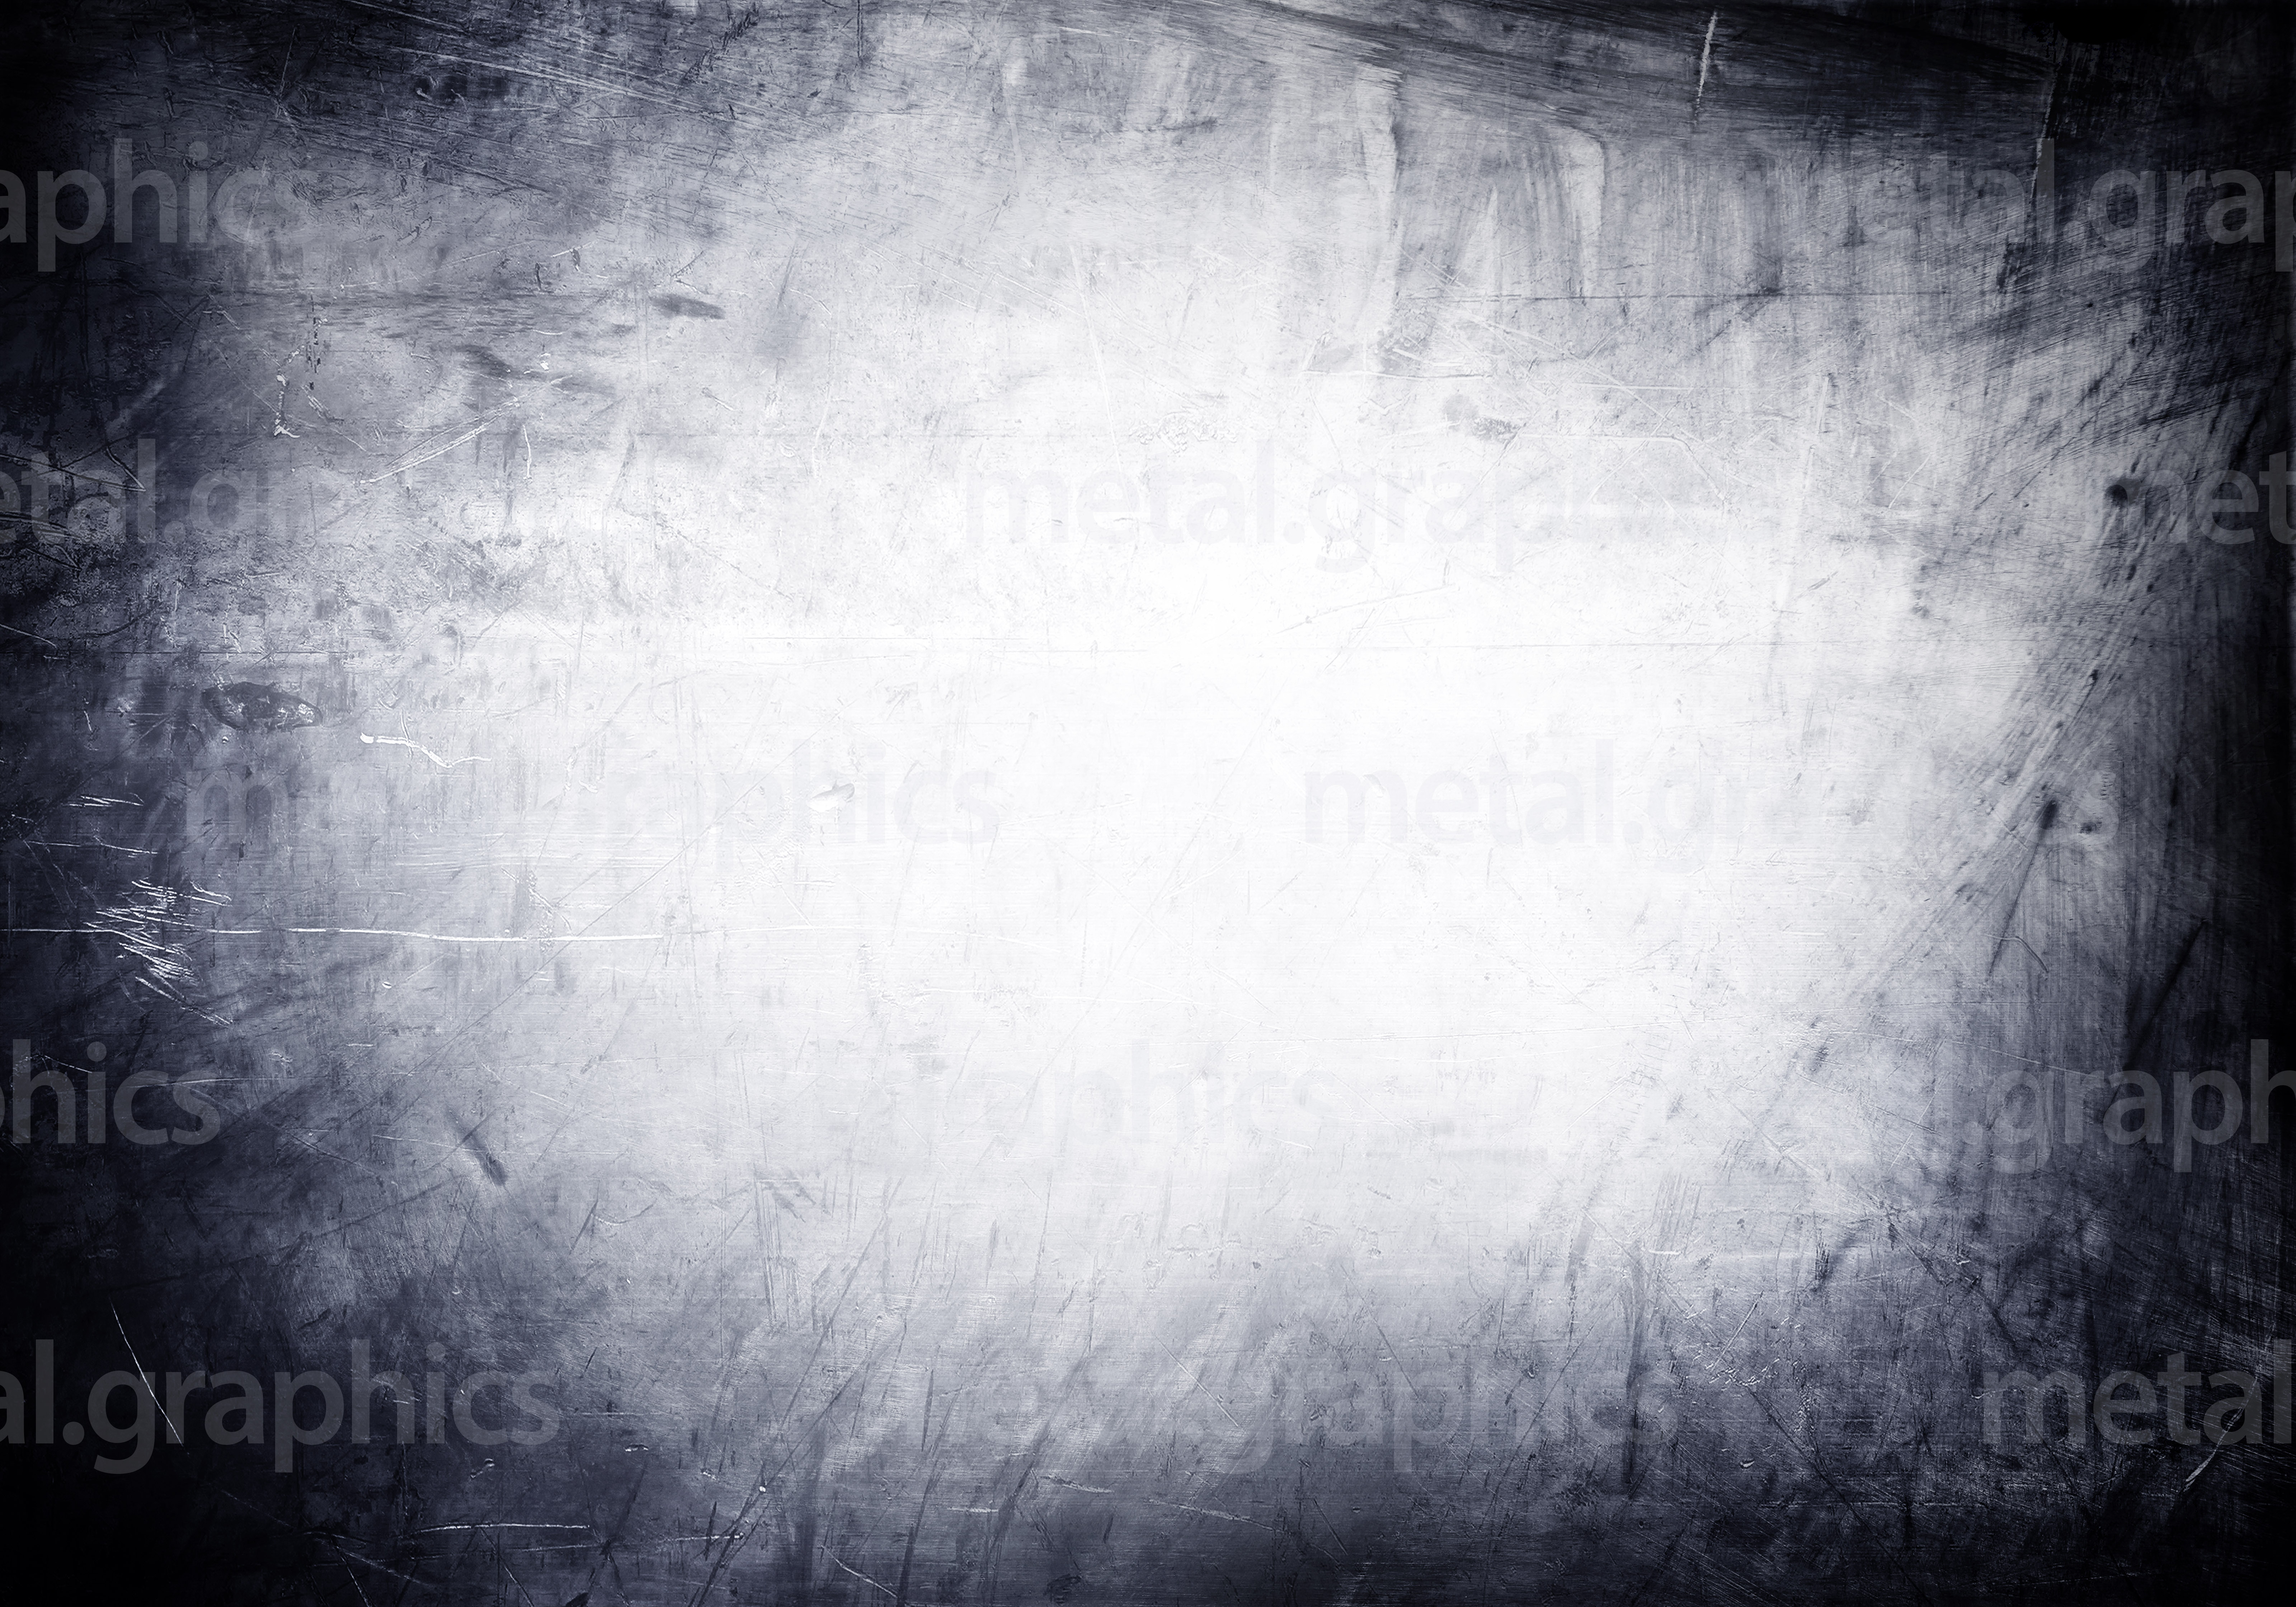 Horror background   Metal Graphics 6400x4480